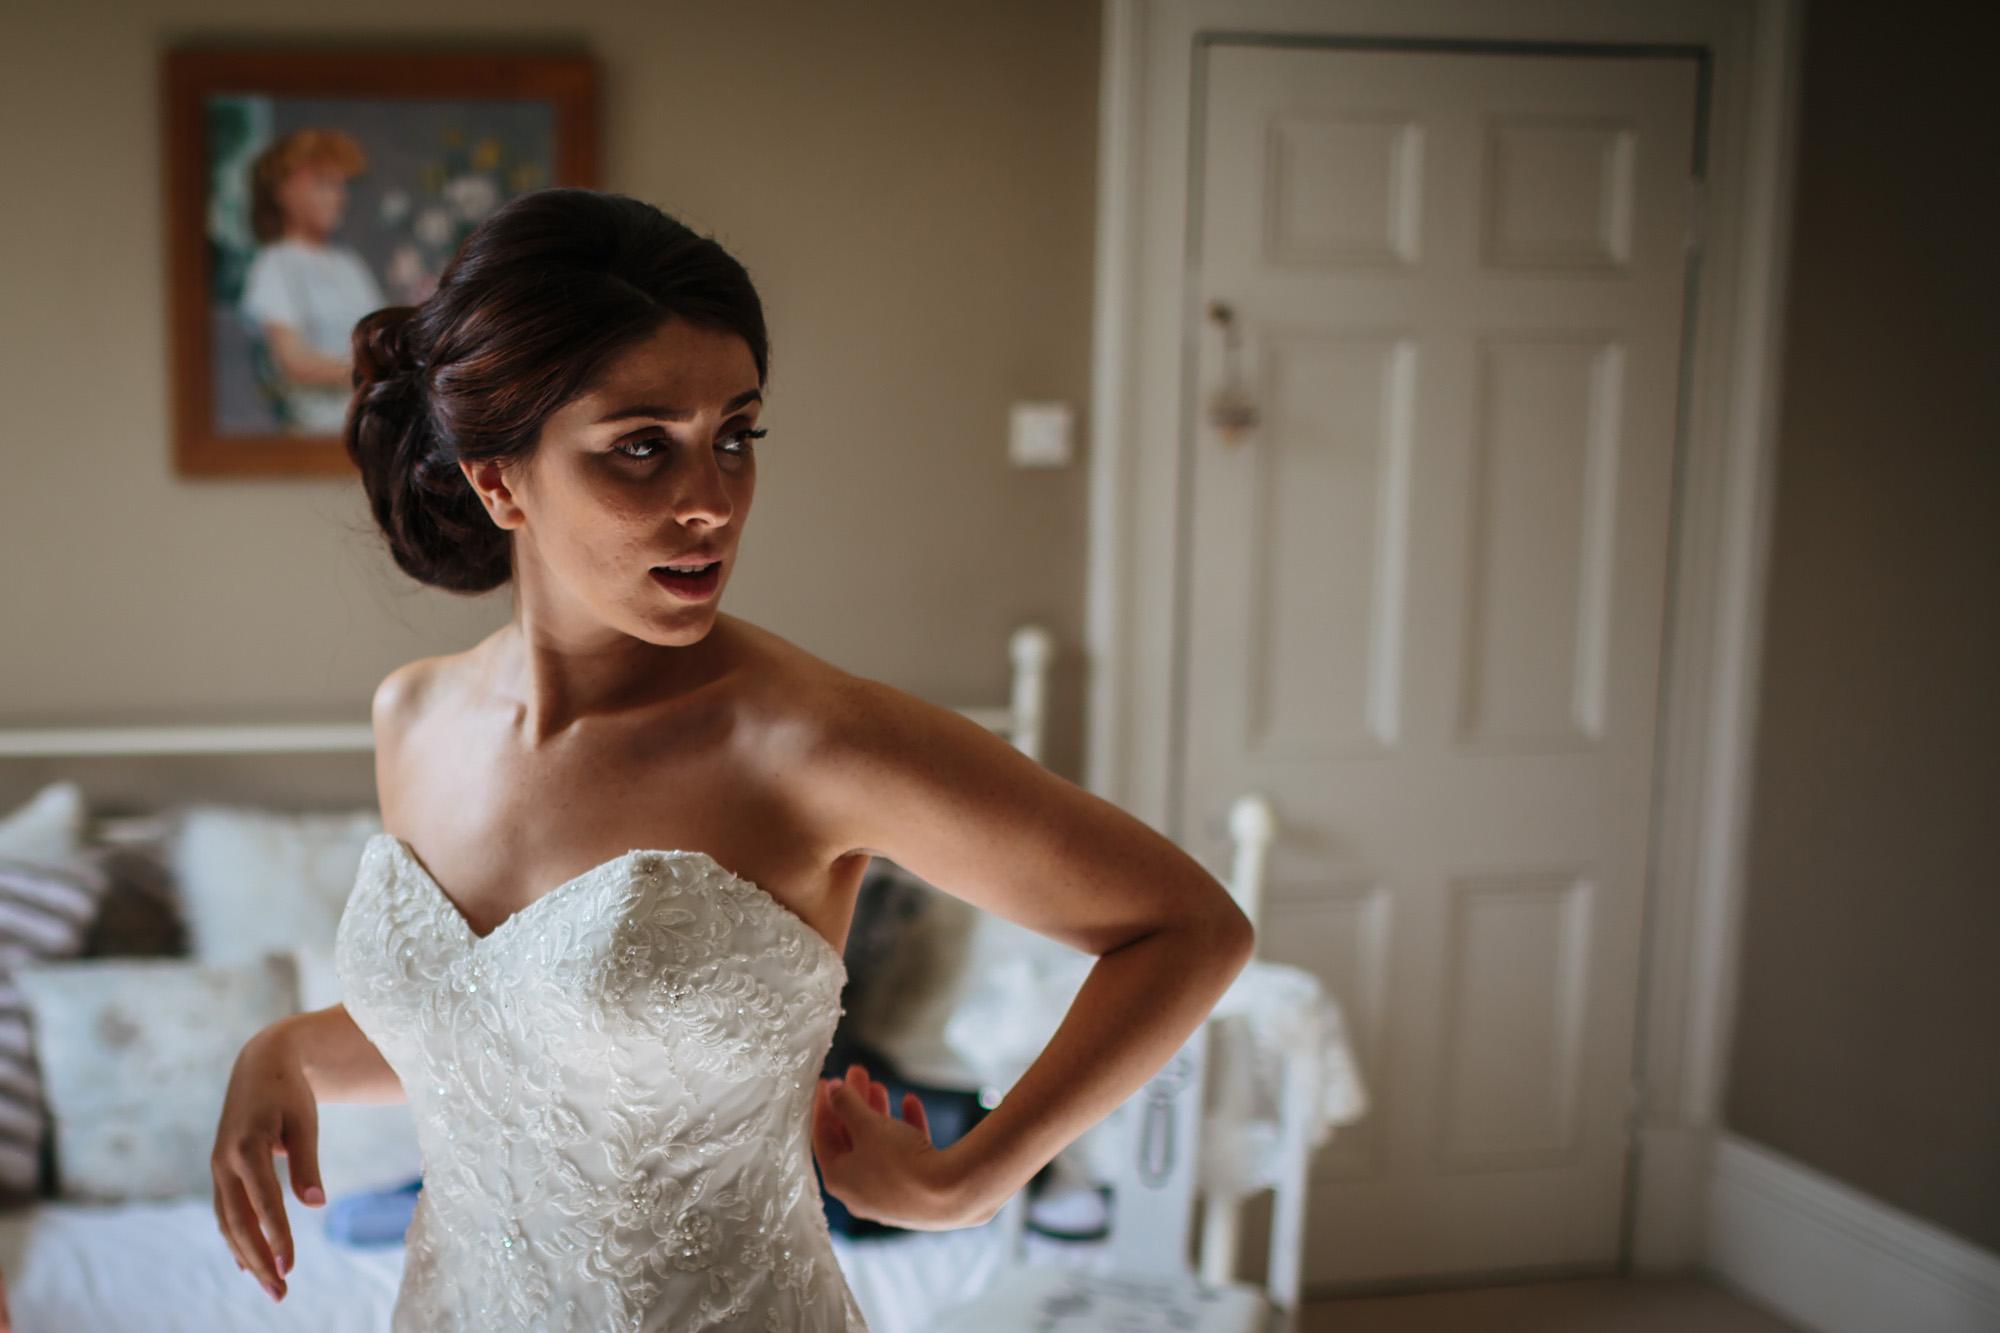 Pretty bride adjusting her wedding dress